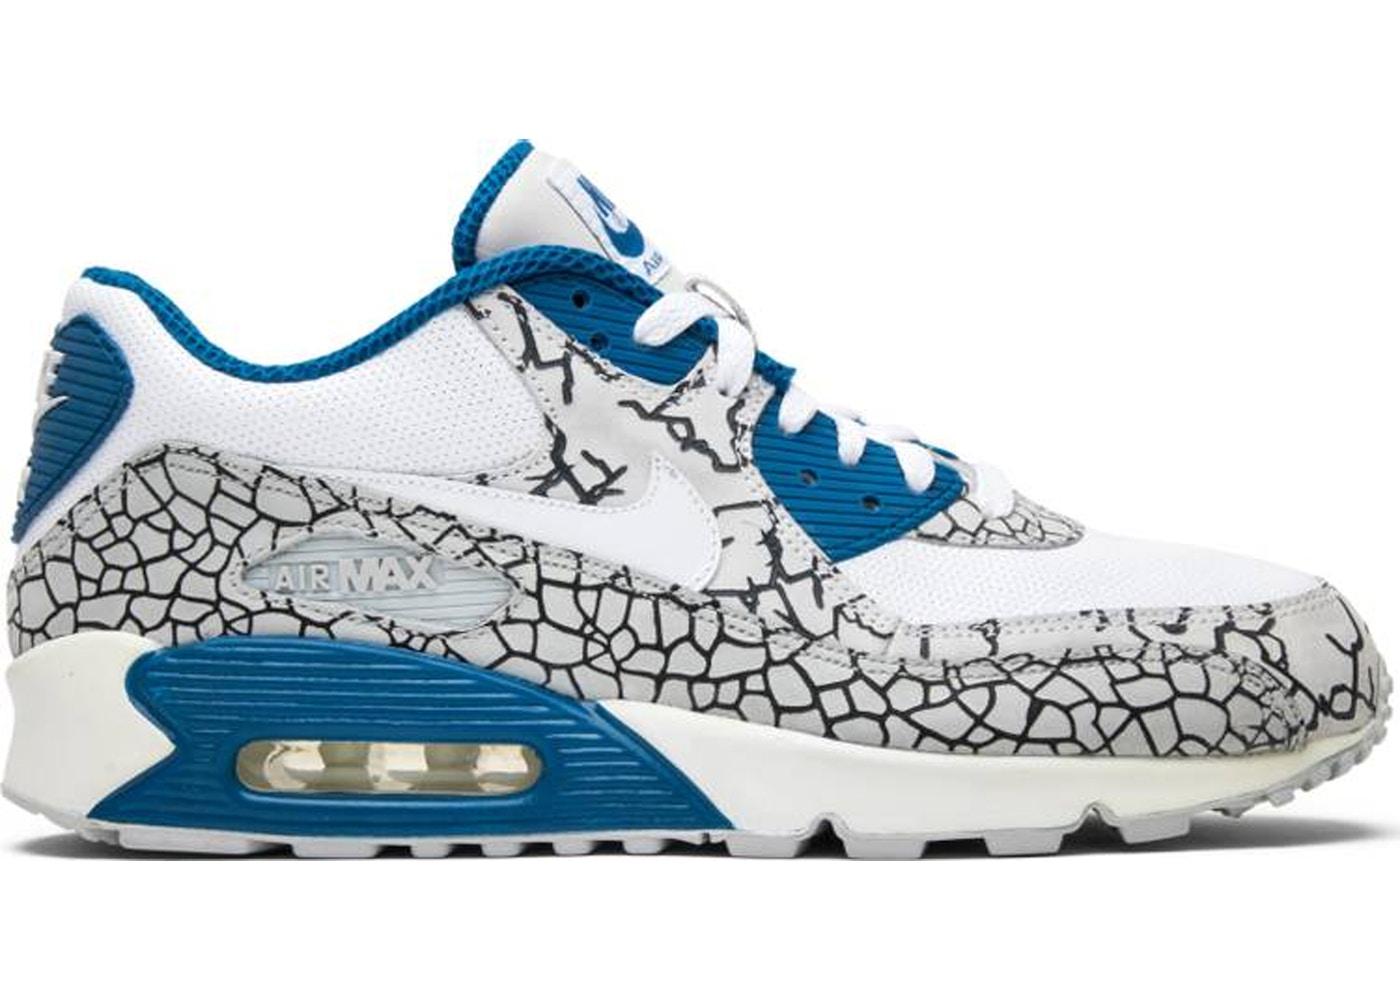 online store 75fcd 82da7 Nike Air Max 90 Shoes - Last Sale